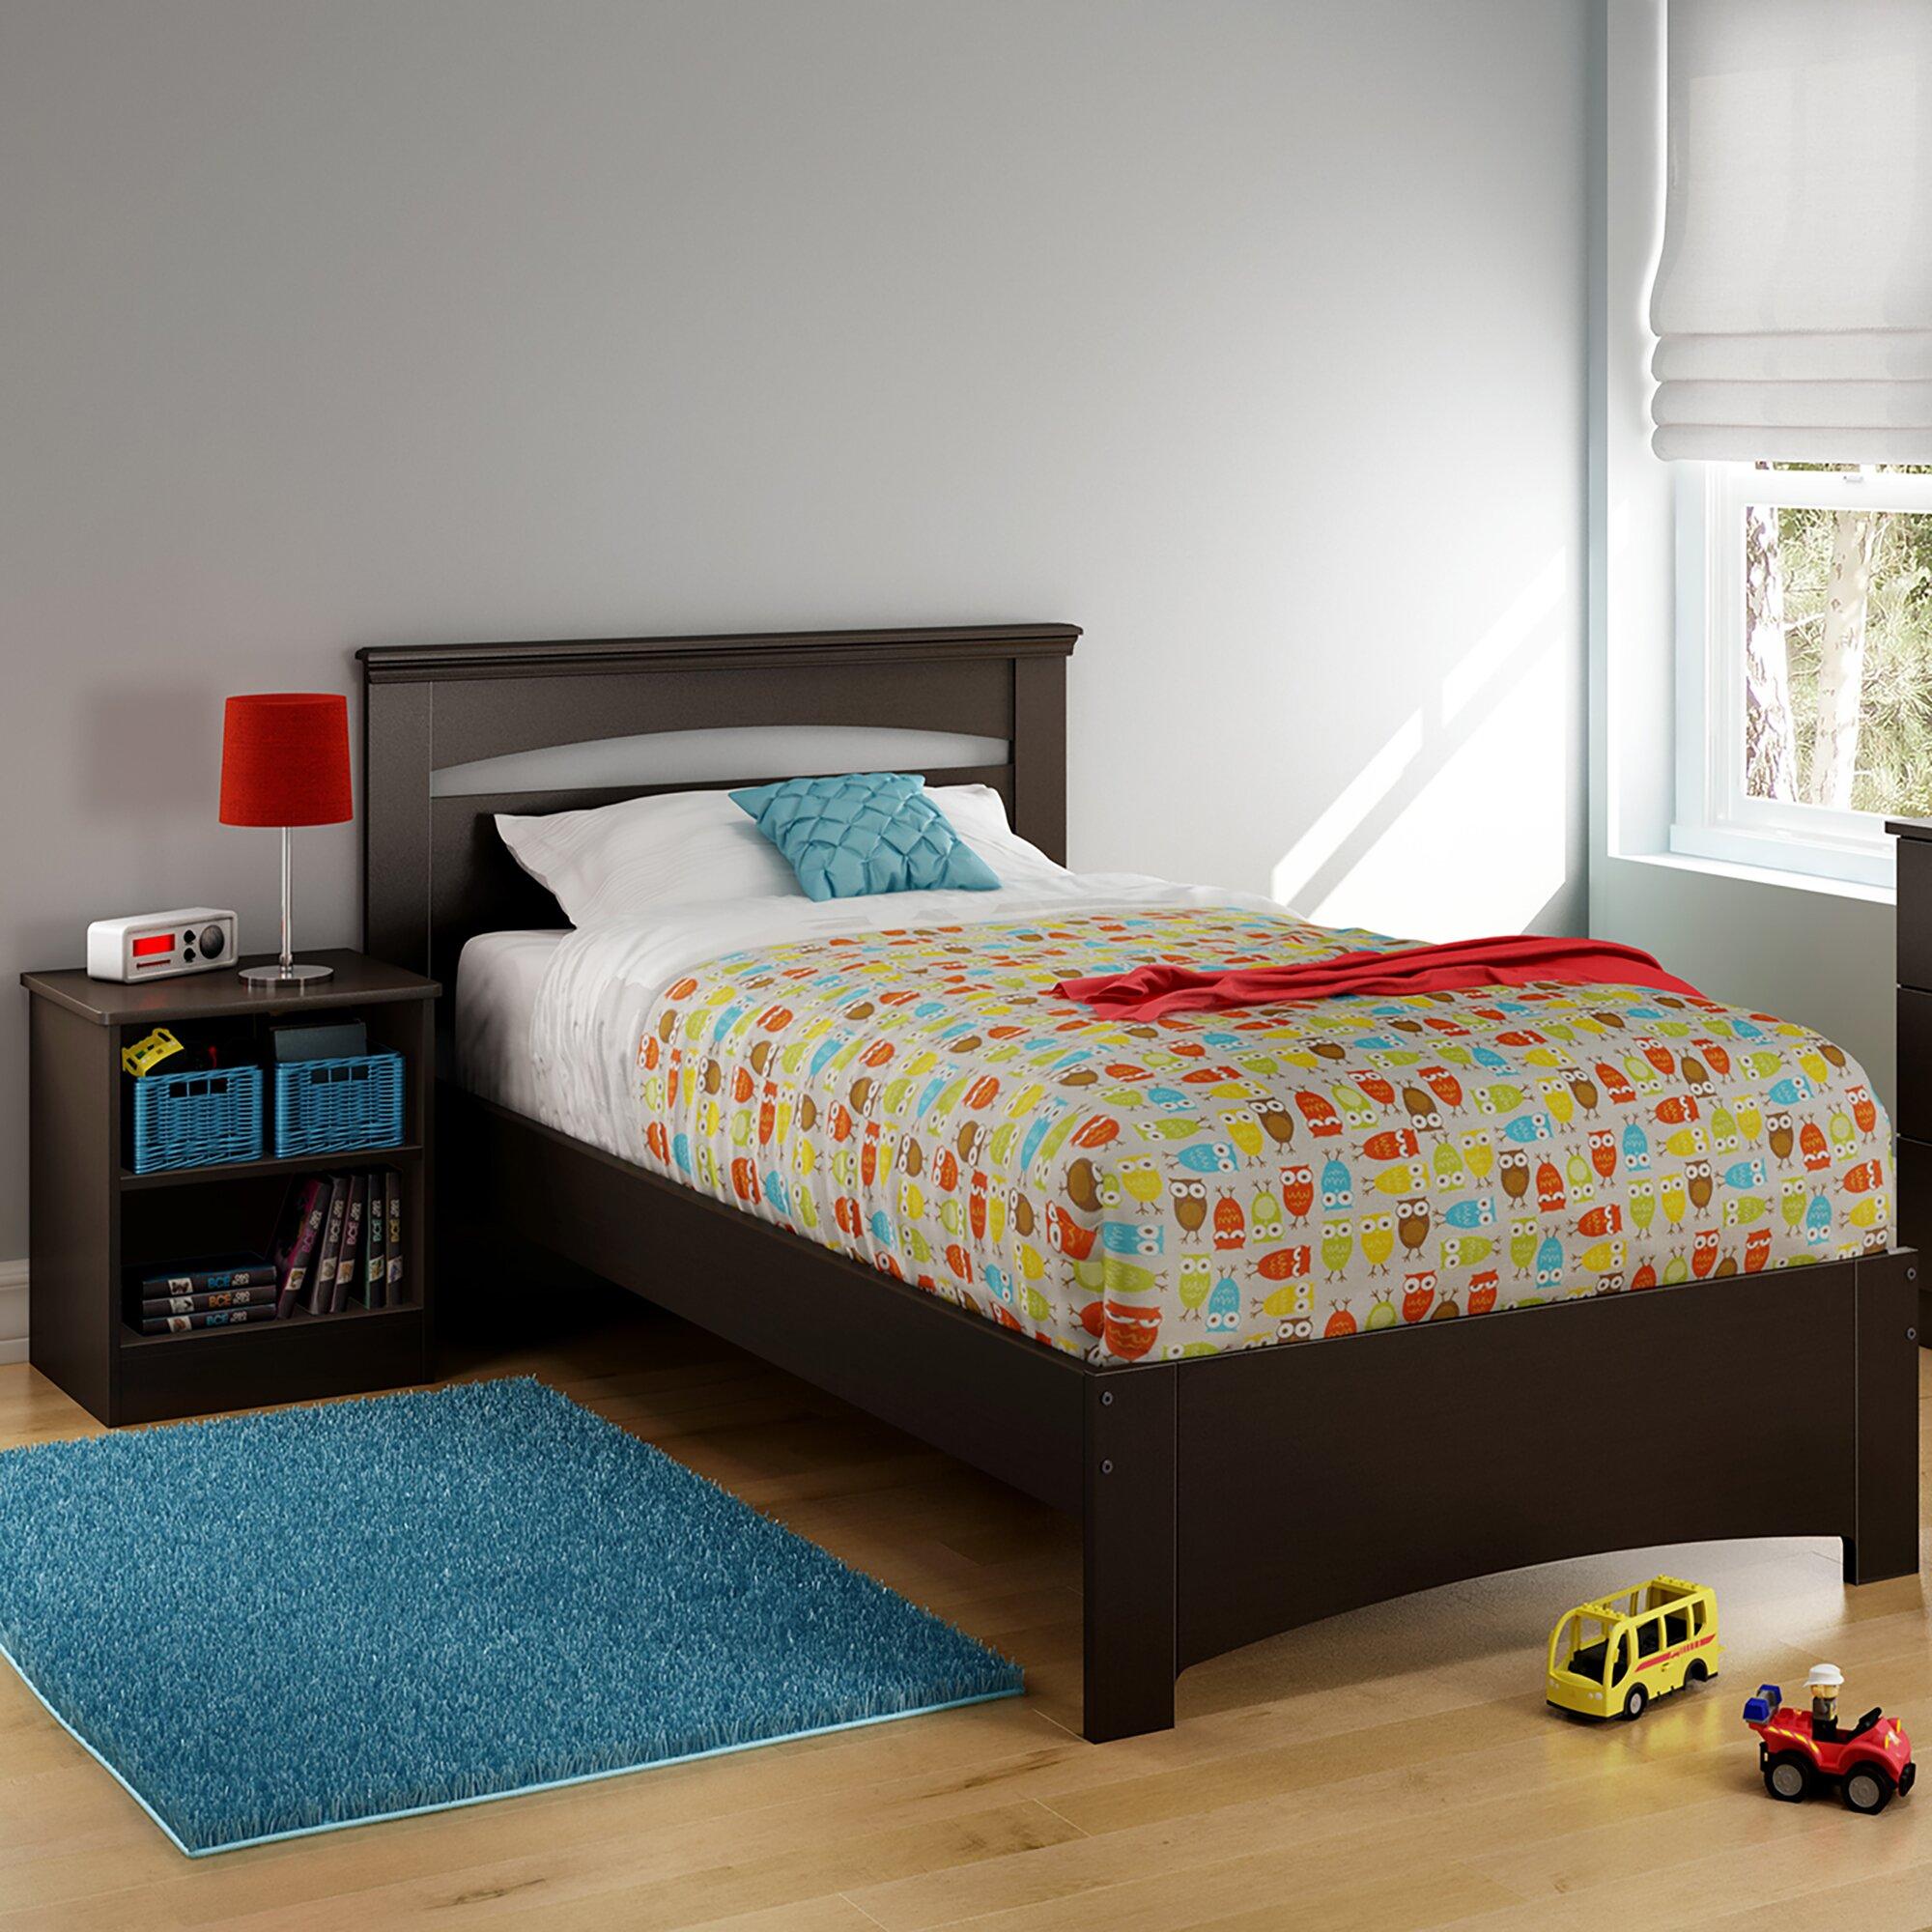 south shore libra twin platform bed reviews wayfair. Black Bedroom Furniture Sets. Home Design Ideas